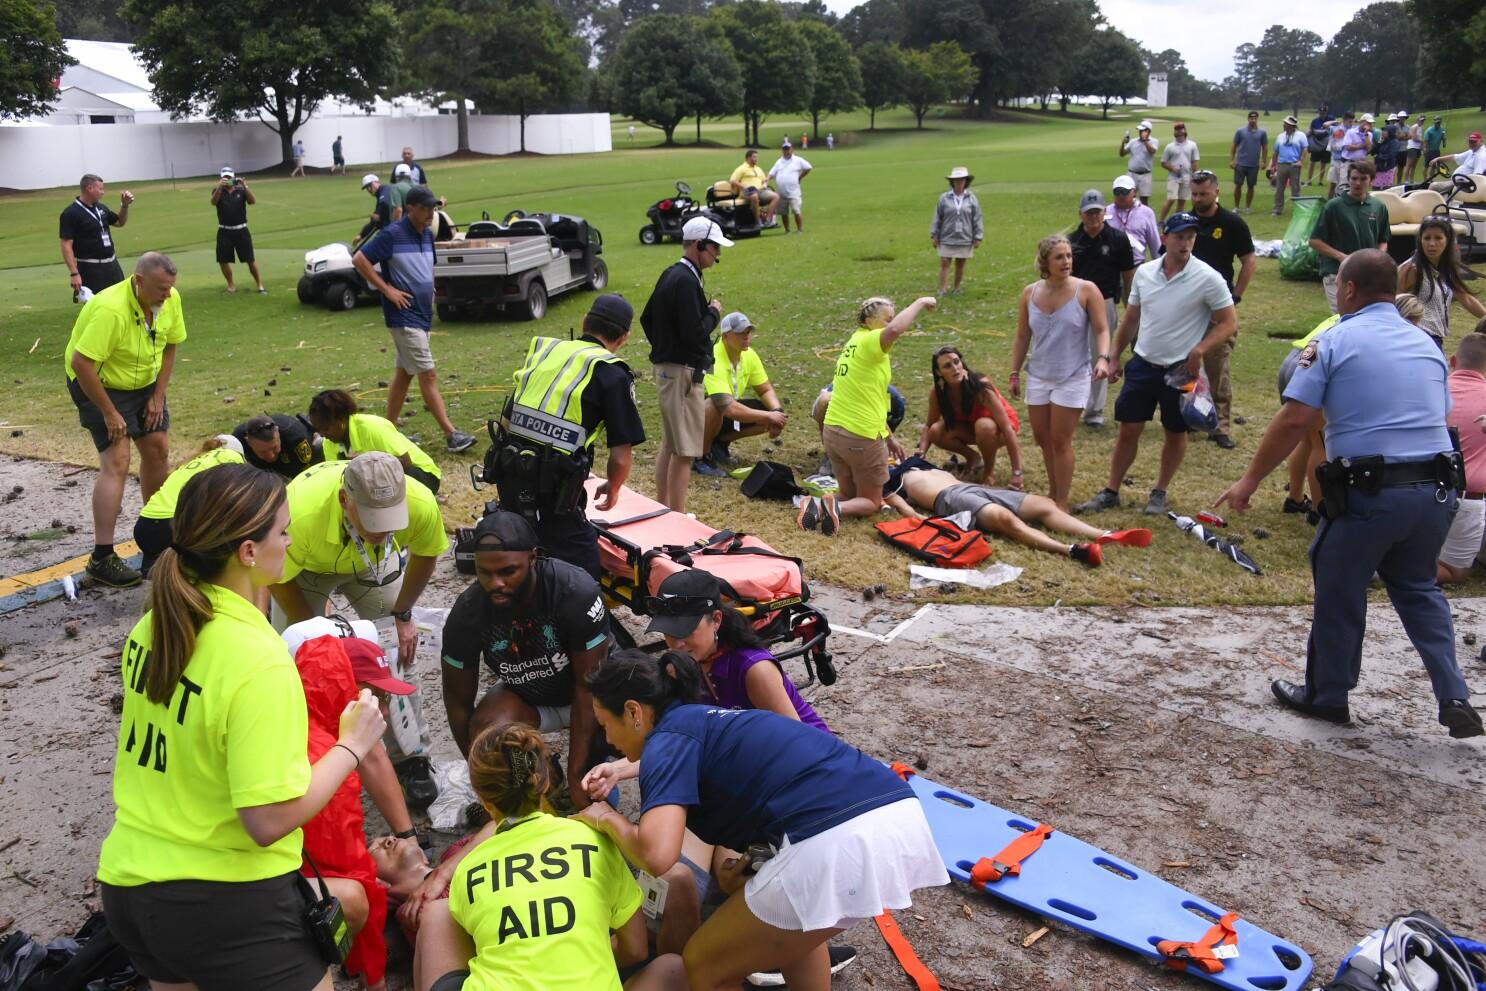 Lightning strike injures multiple fans at Tour Championship